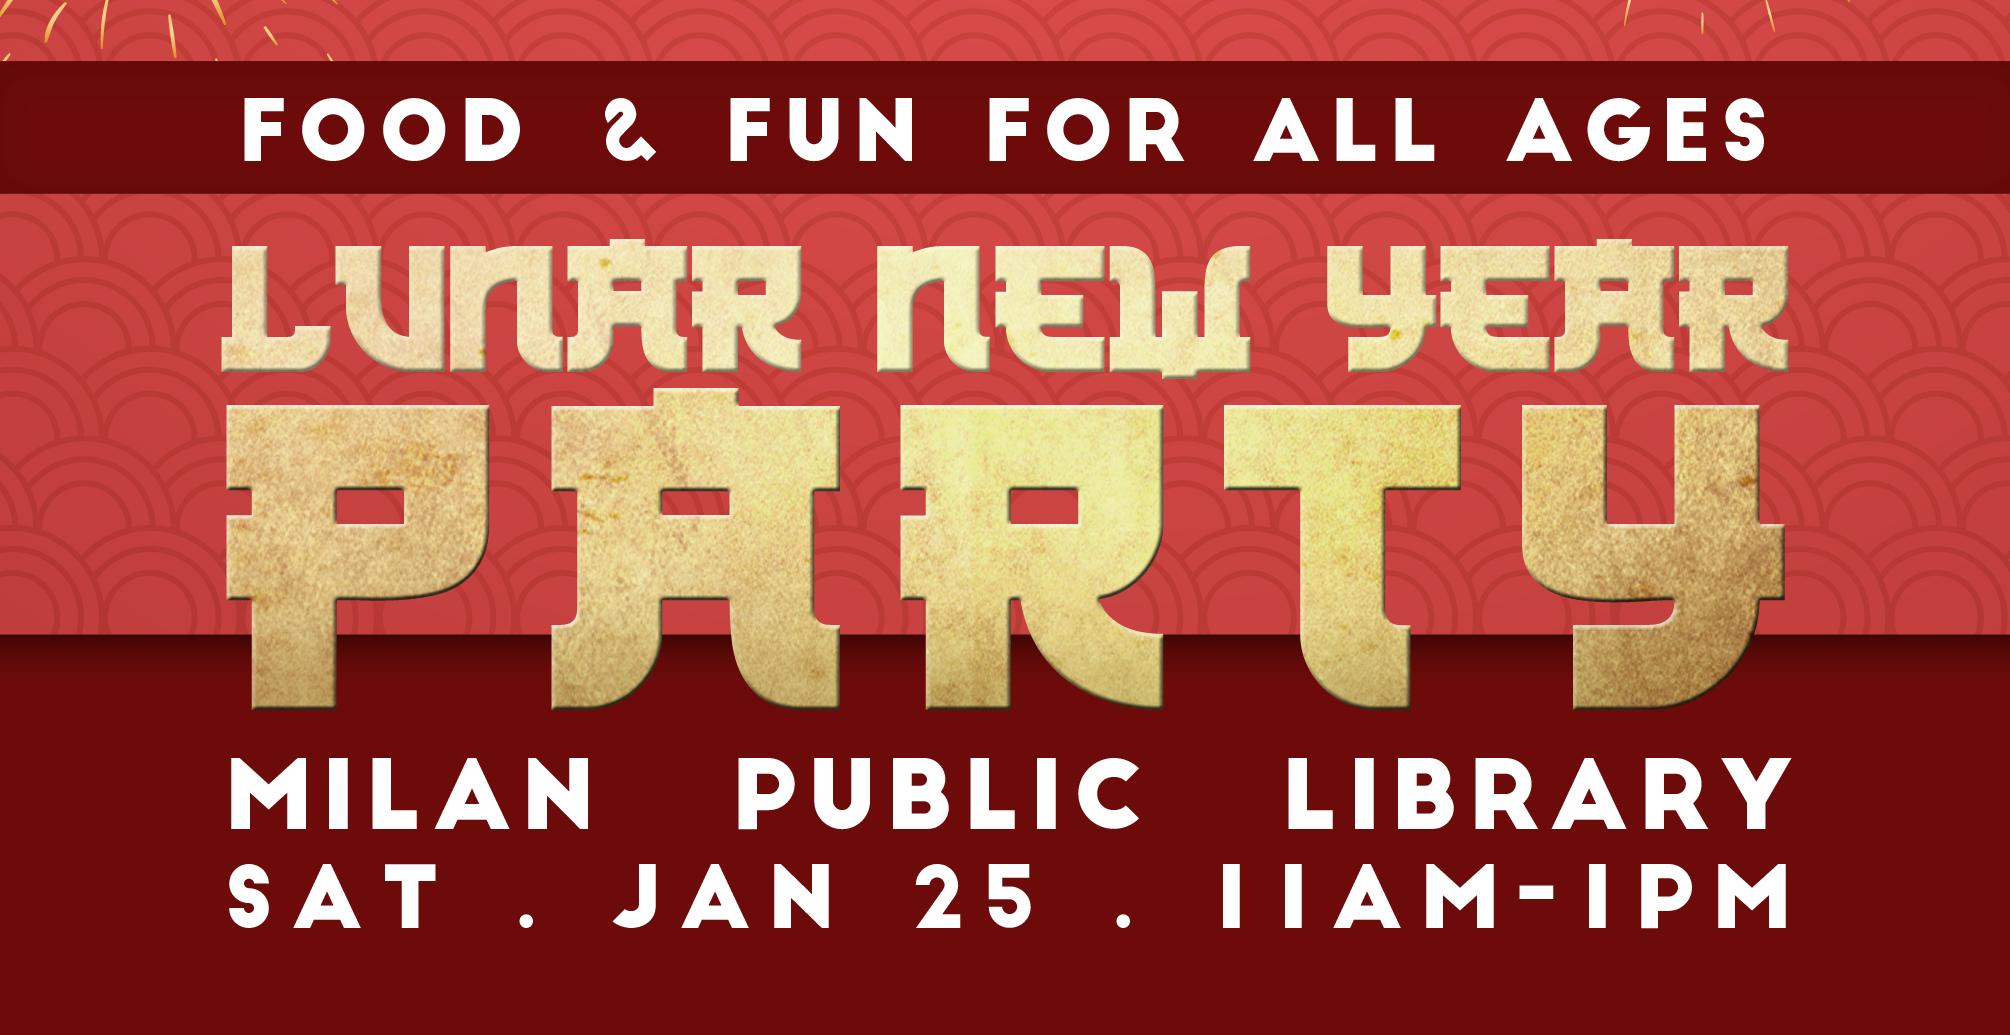 2020-01-LIBRARY-Milan-Lunar-New-Year-Slide